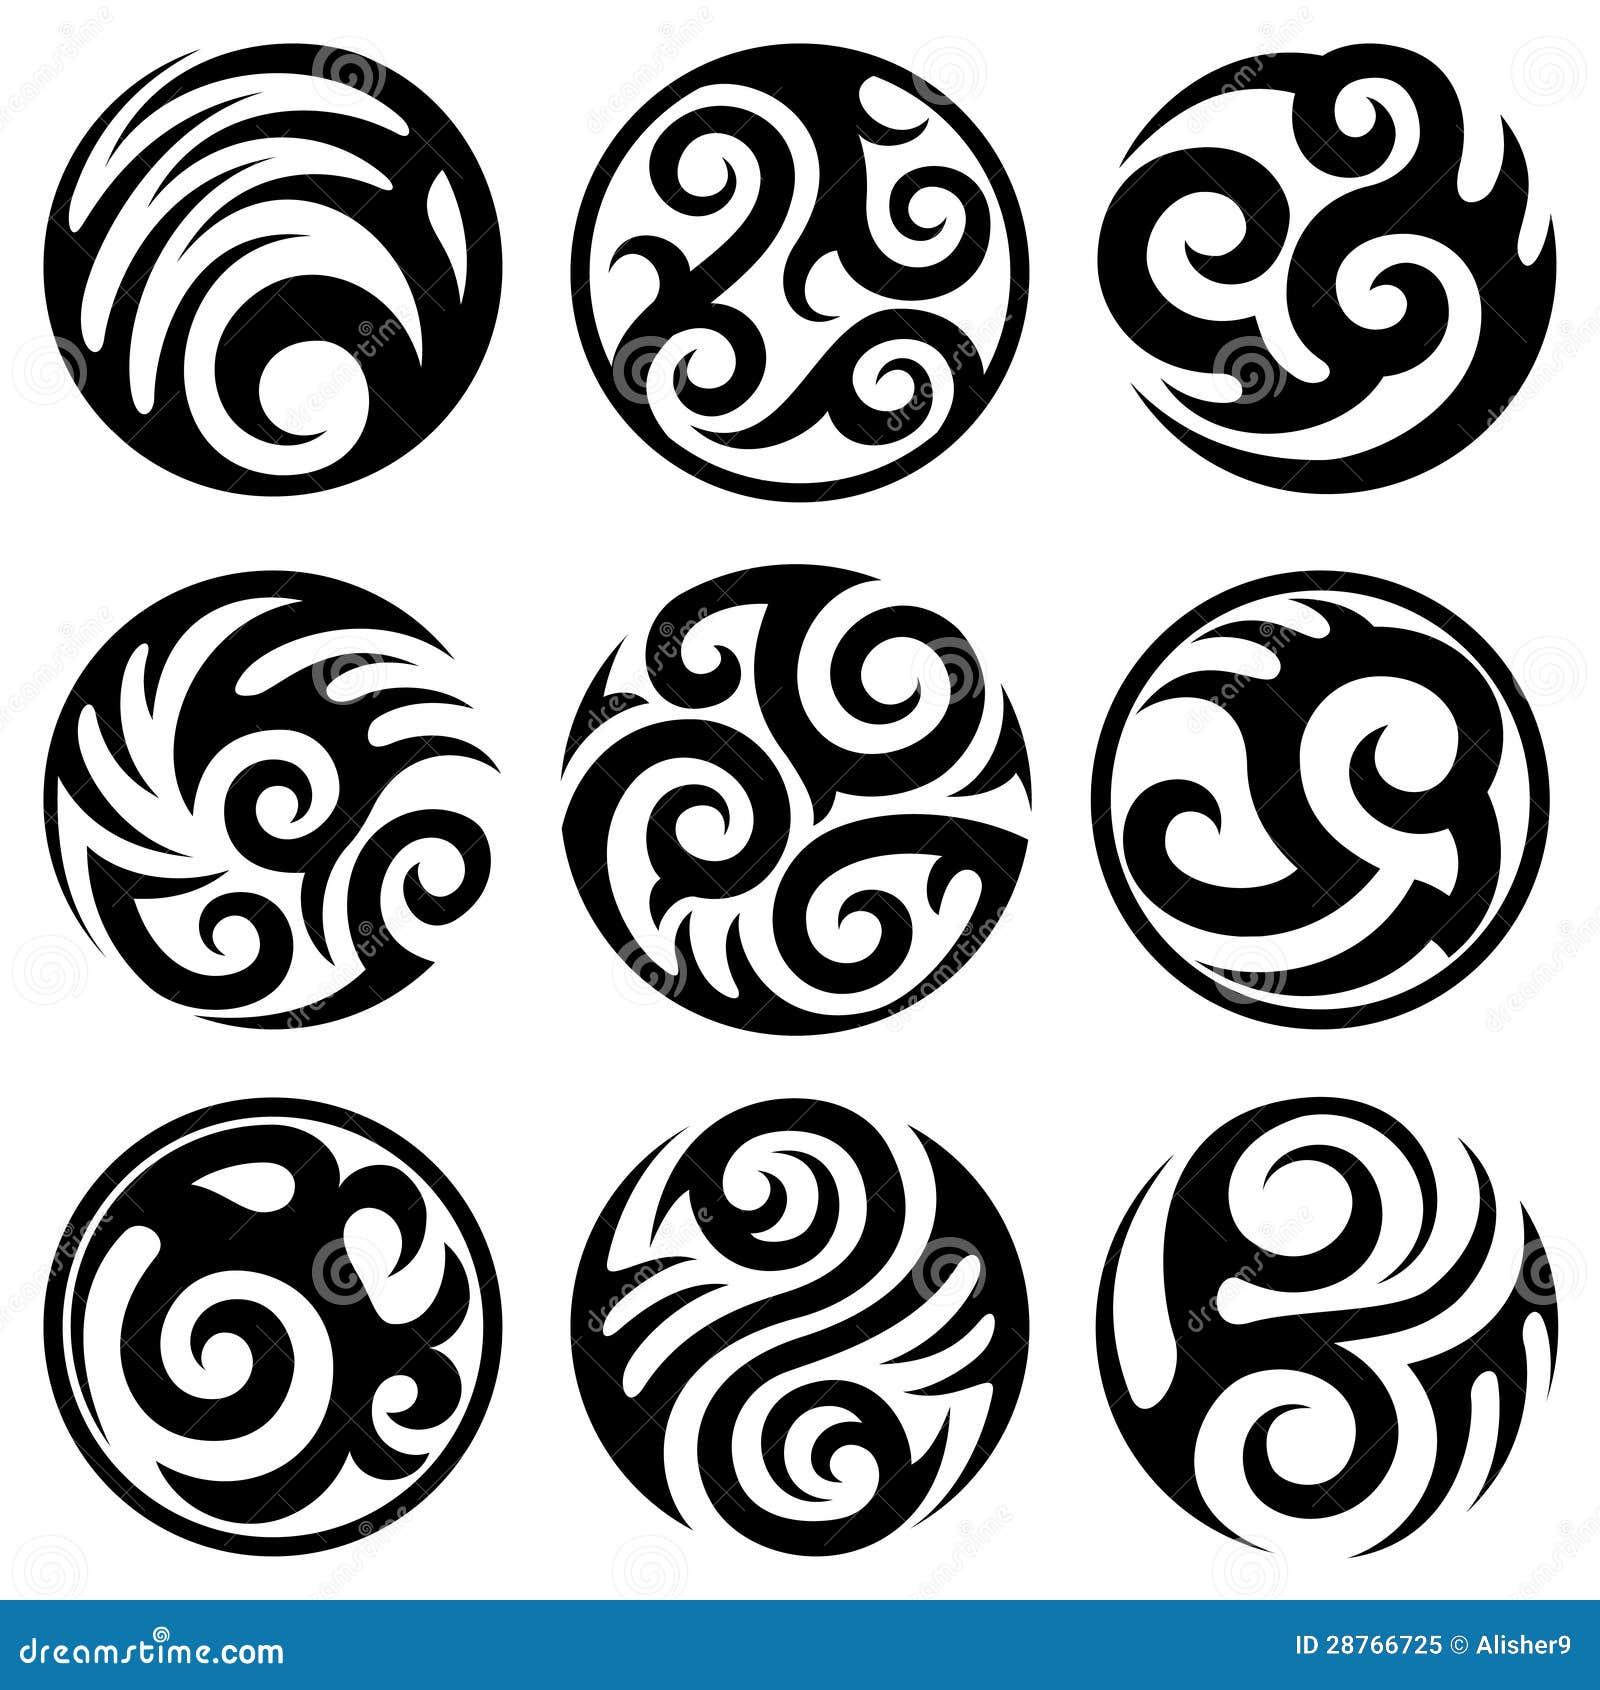 Round tribal tattoos set stock vector illustration of flame 28766725 - Dibujos tribales para tatuar ...